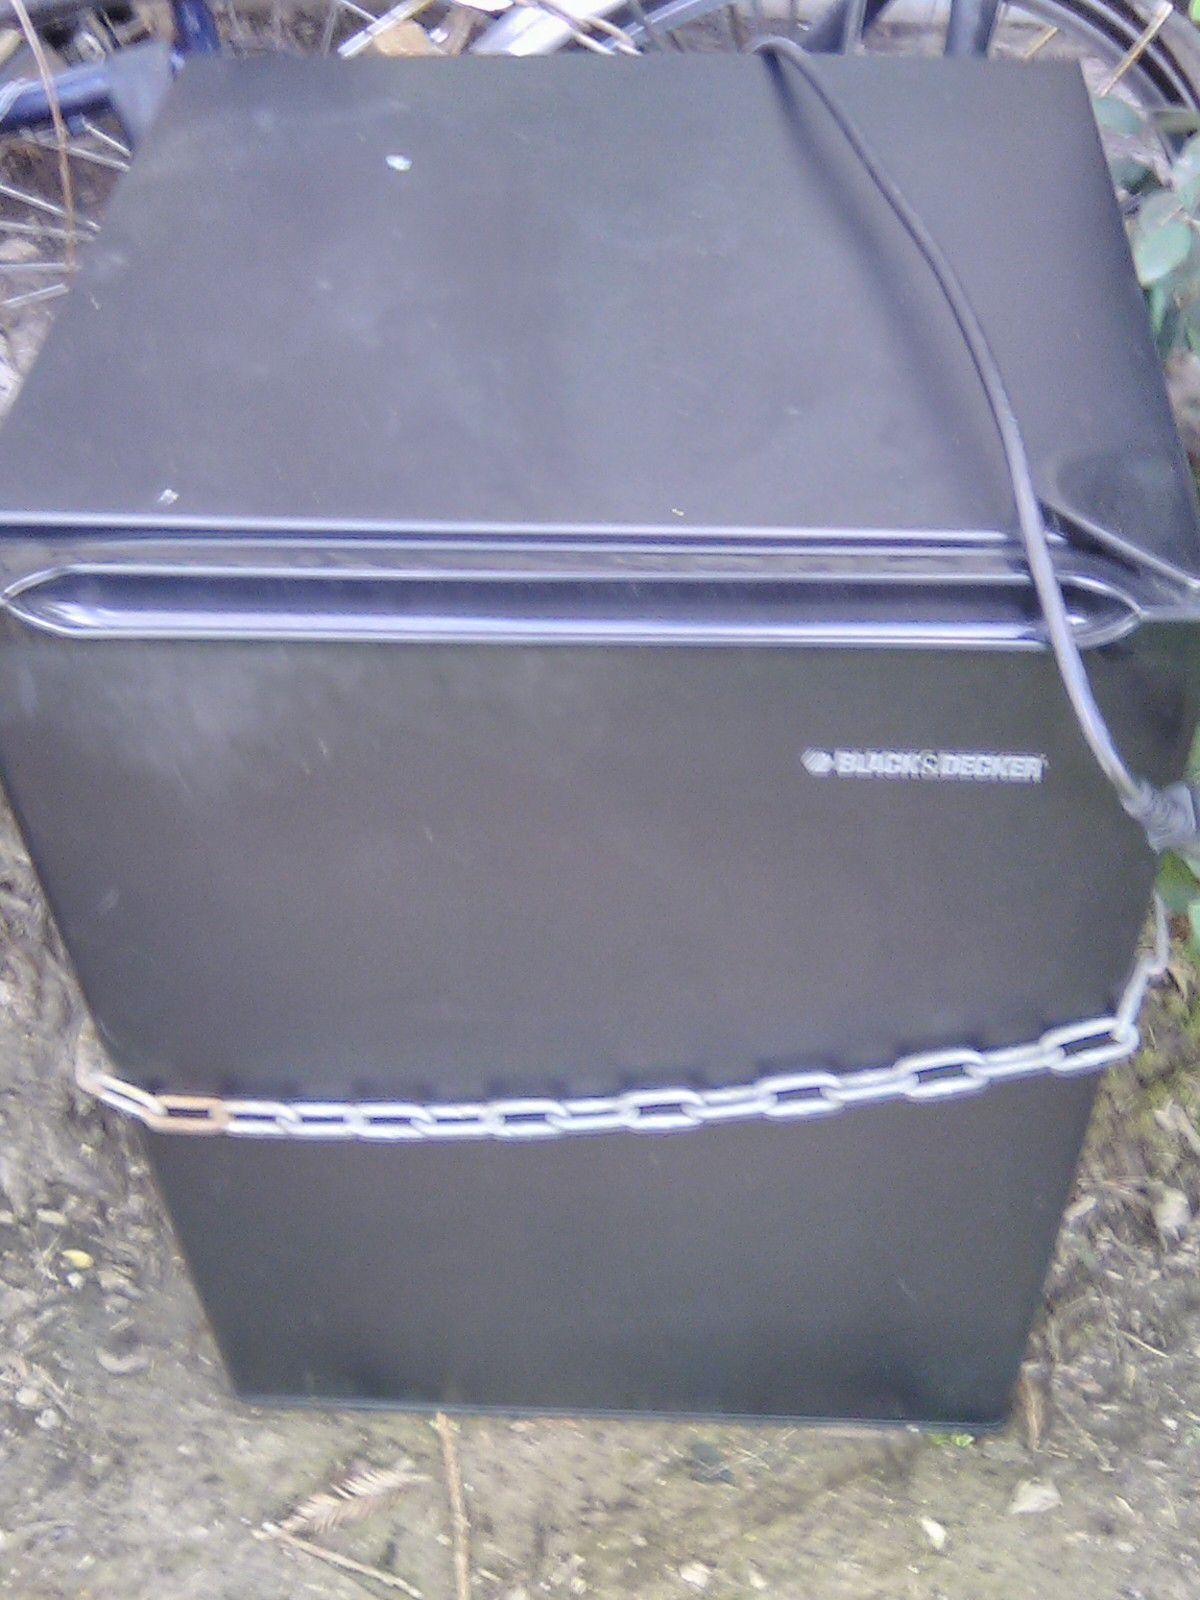 Black n decker black mini fridge